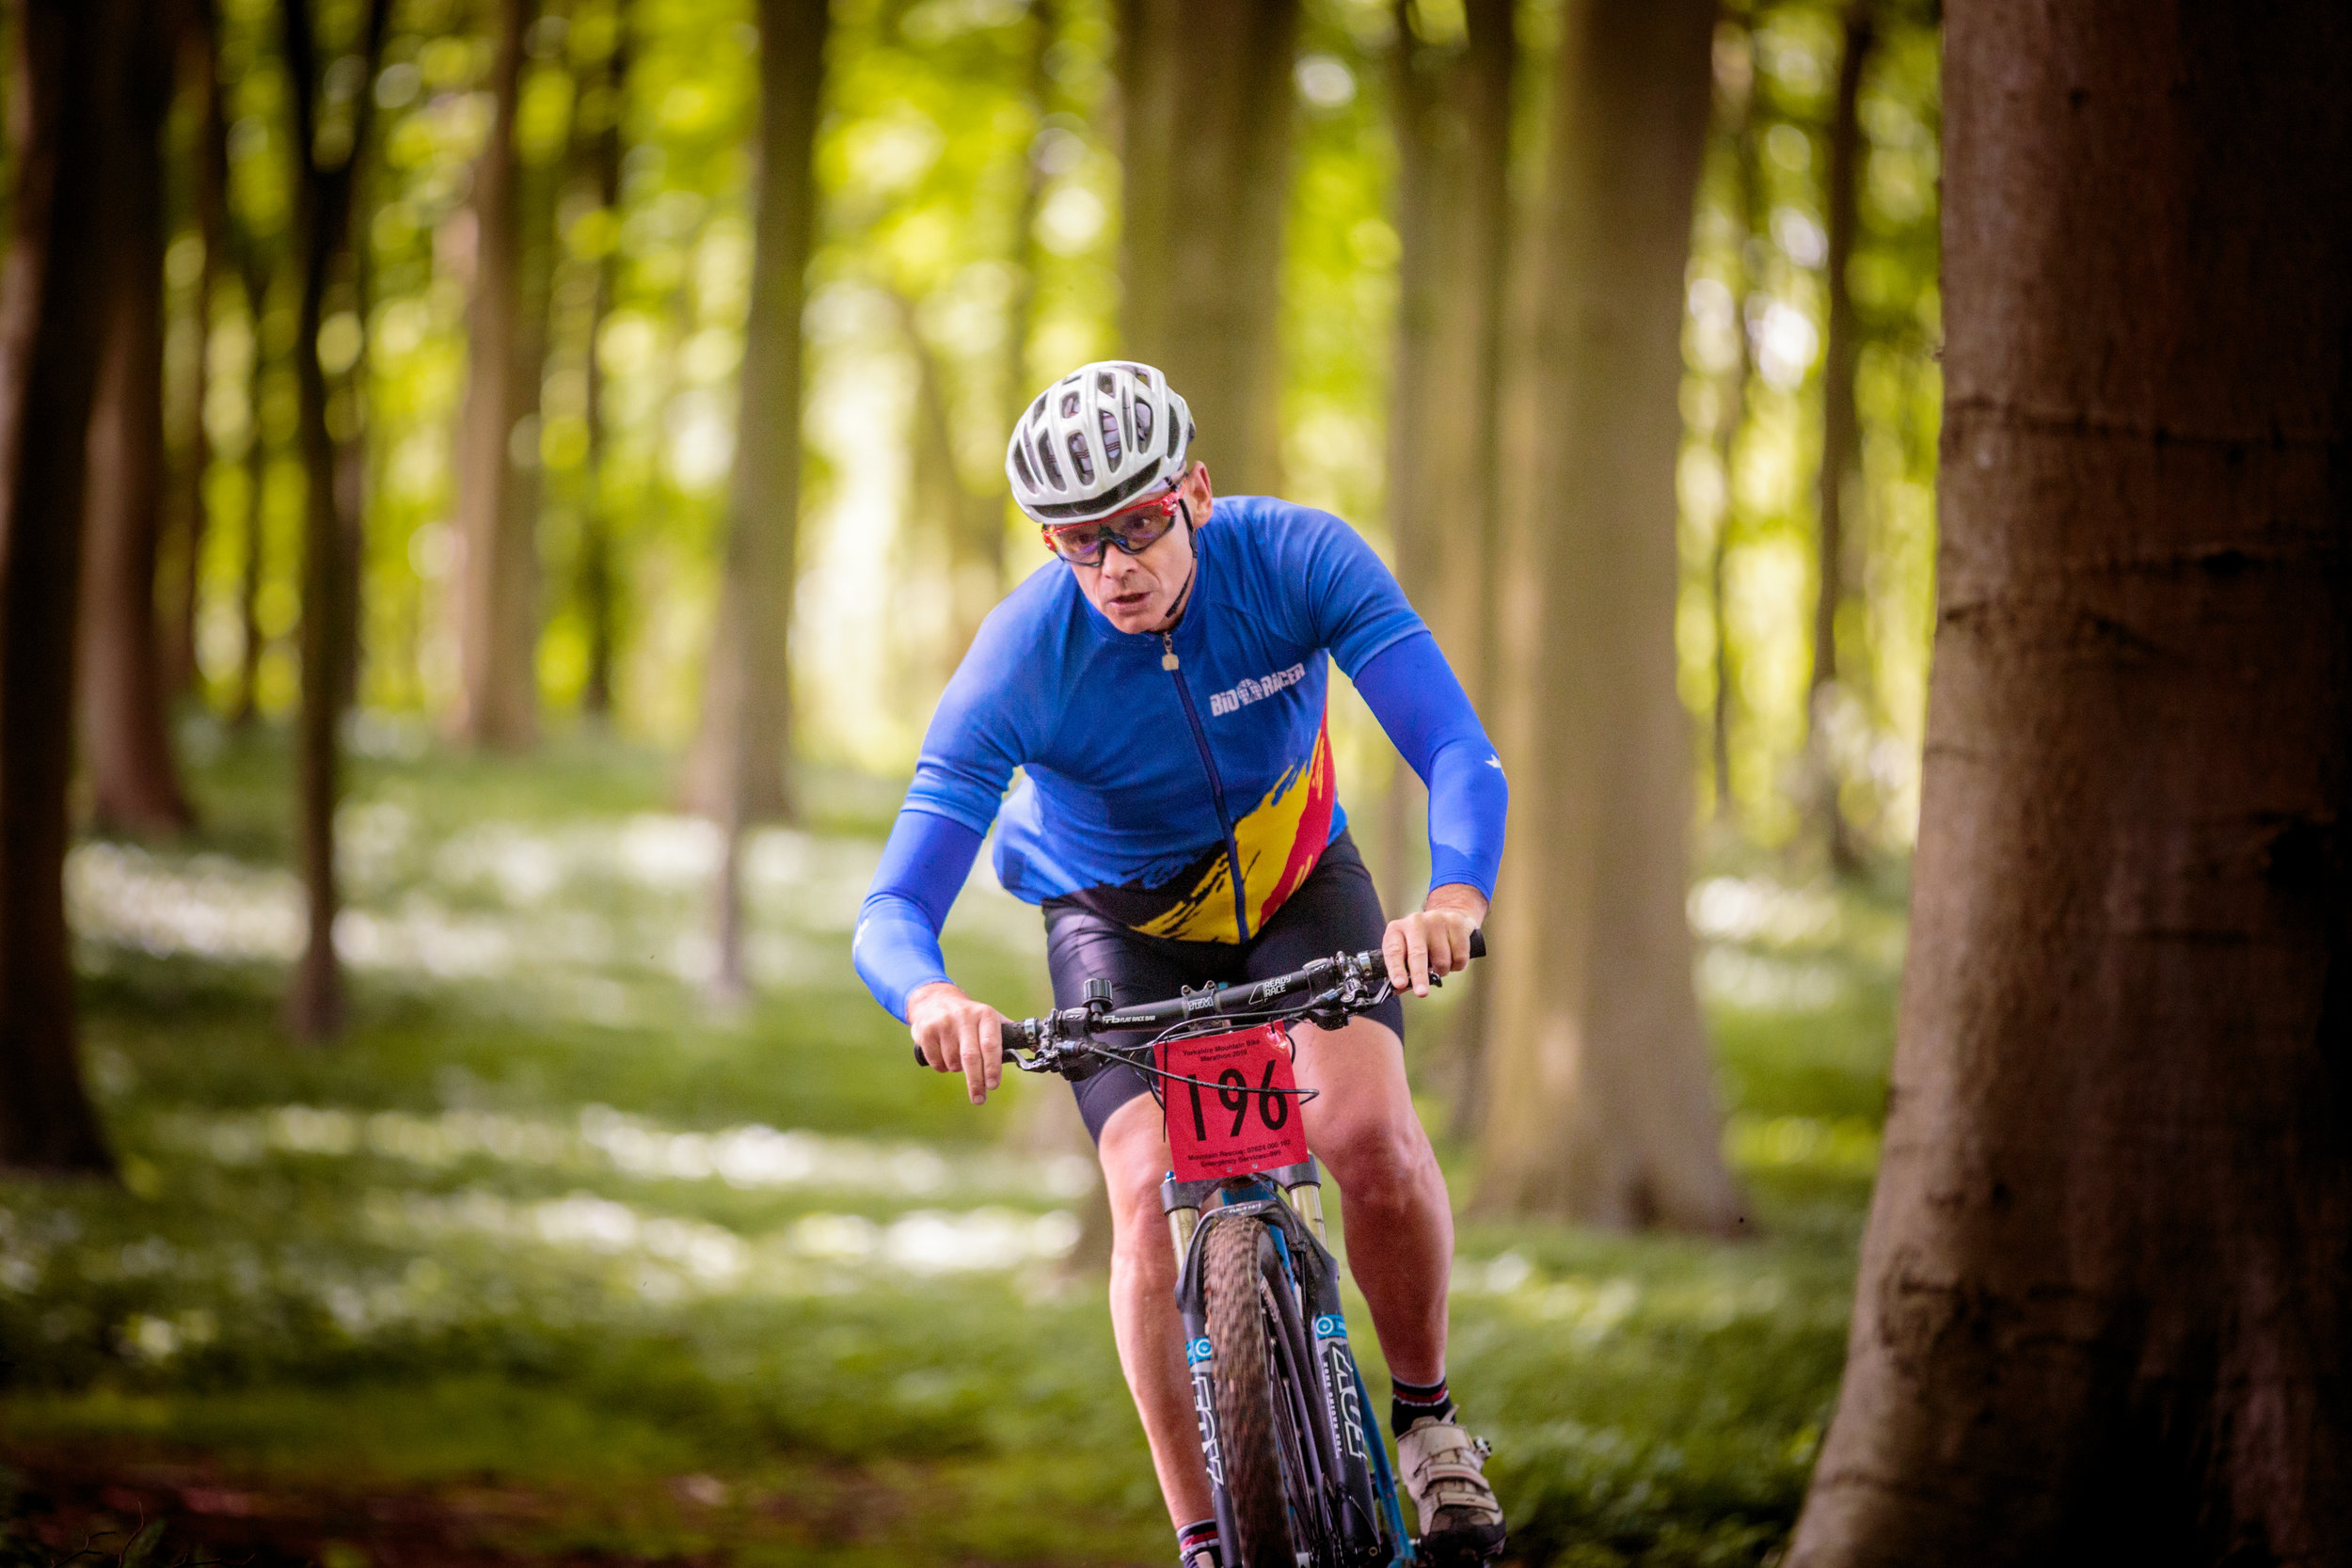 Yorkshire Mountain Biker